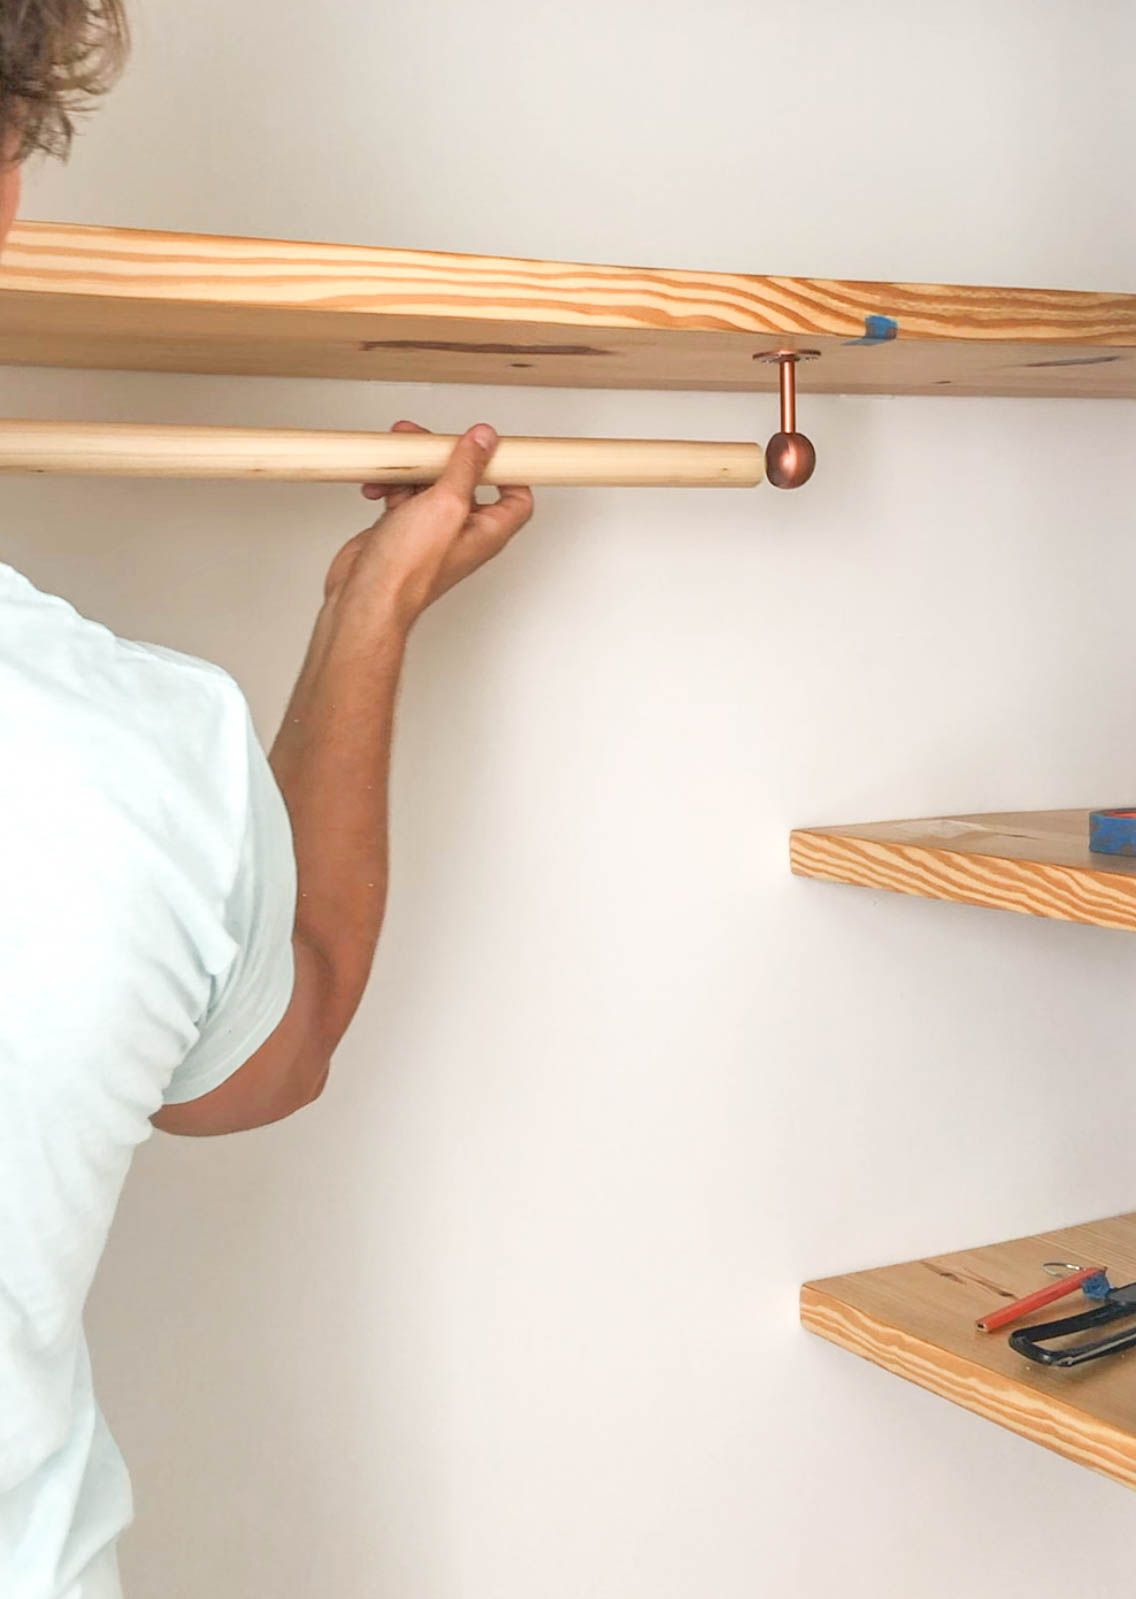 Diy Floating Wood Shelves Clothing Bar In Honor Of Design In 2020 Wood Shelves Wood Shelves Bedroom Wood Closet Shelves